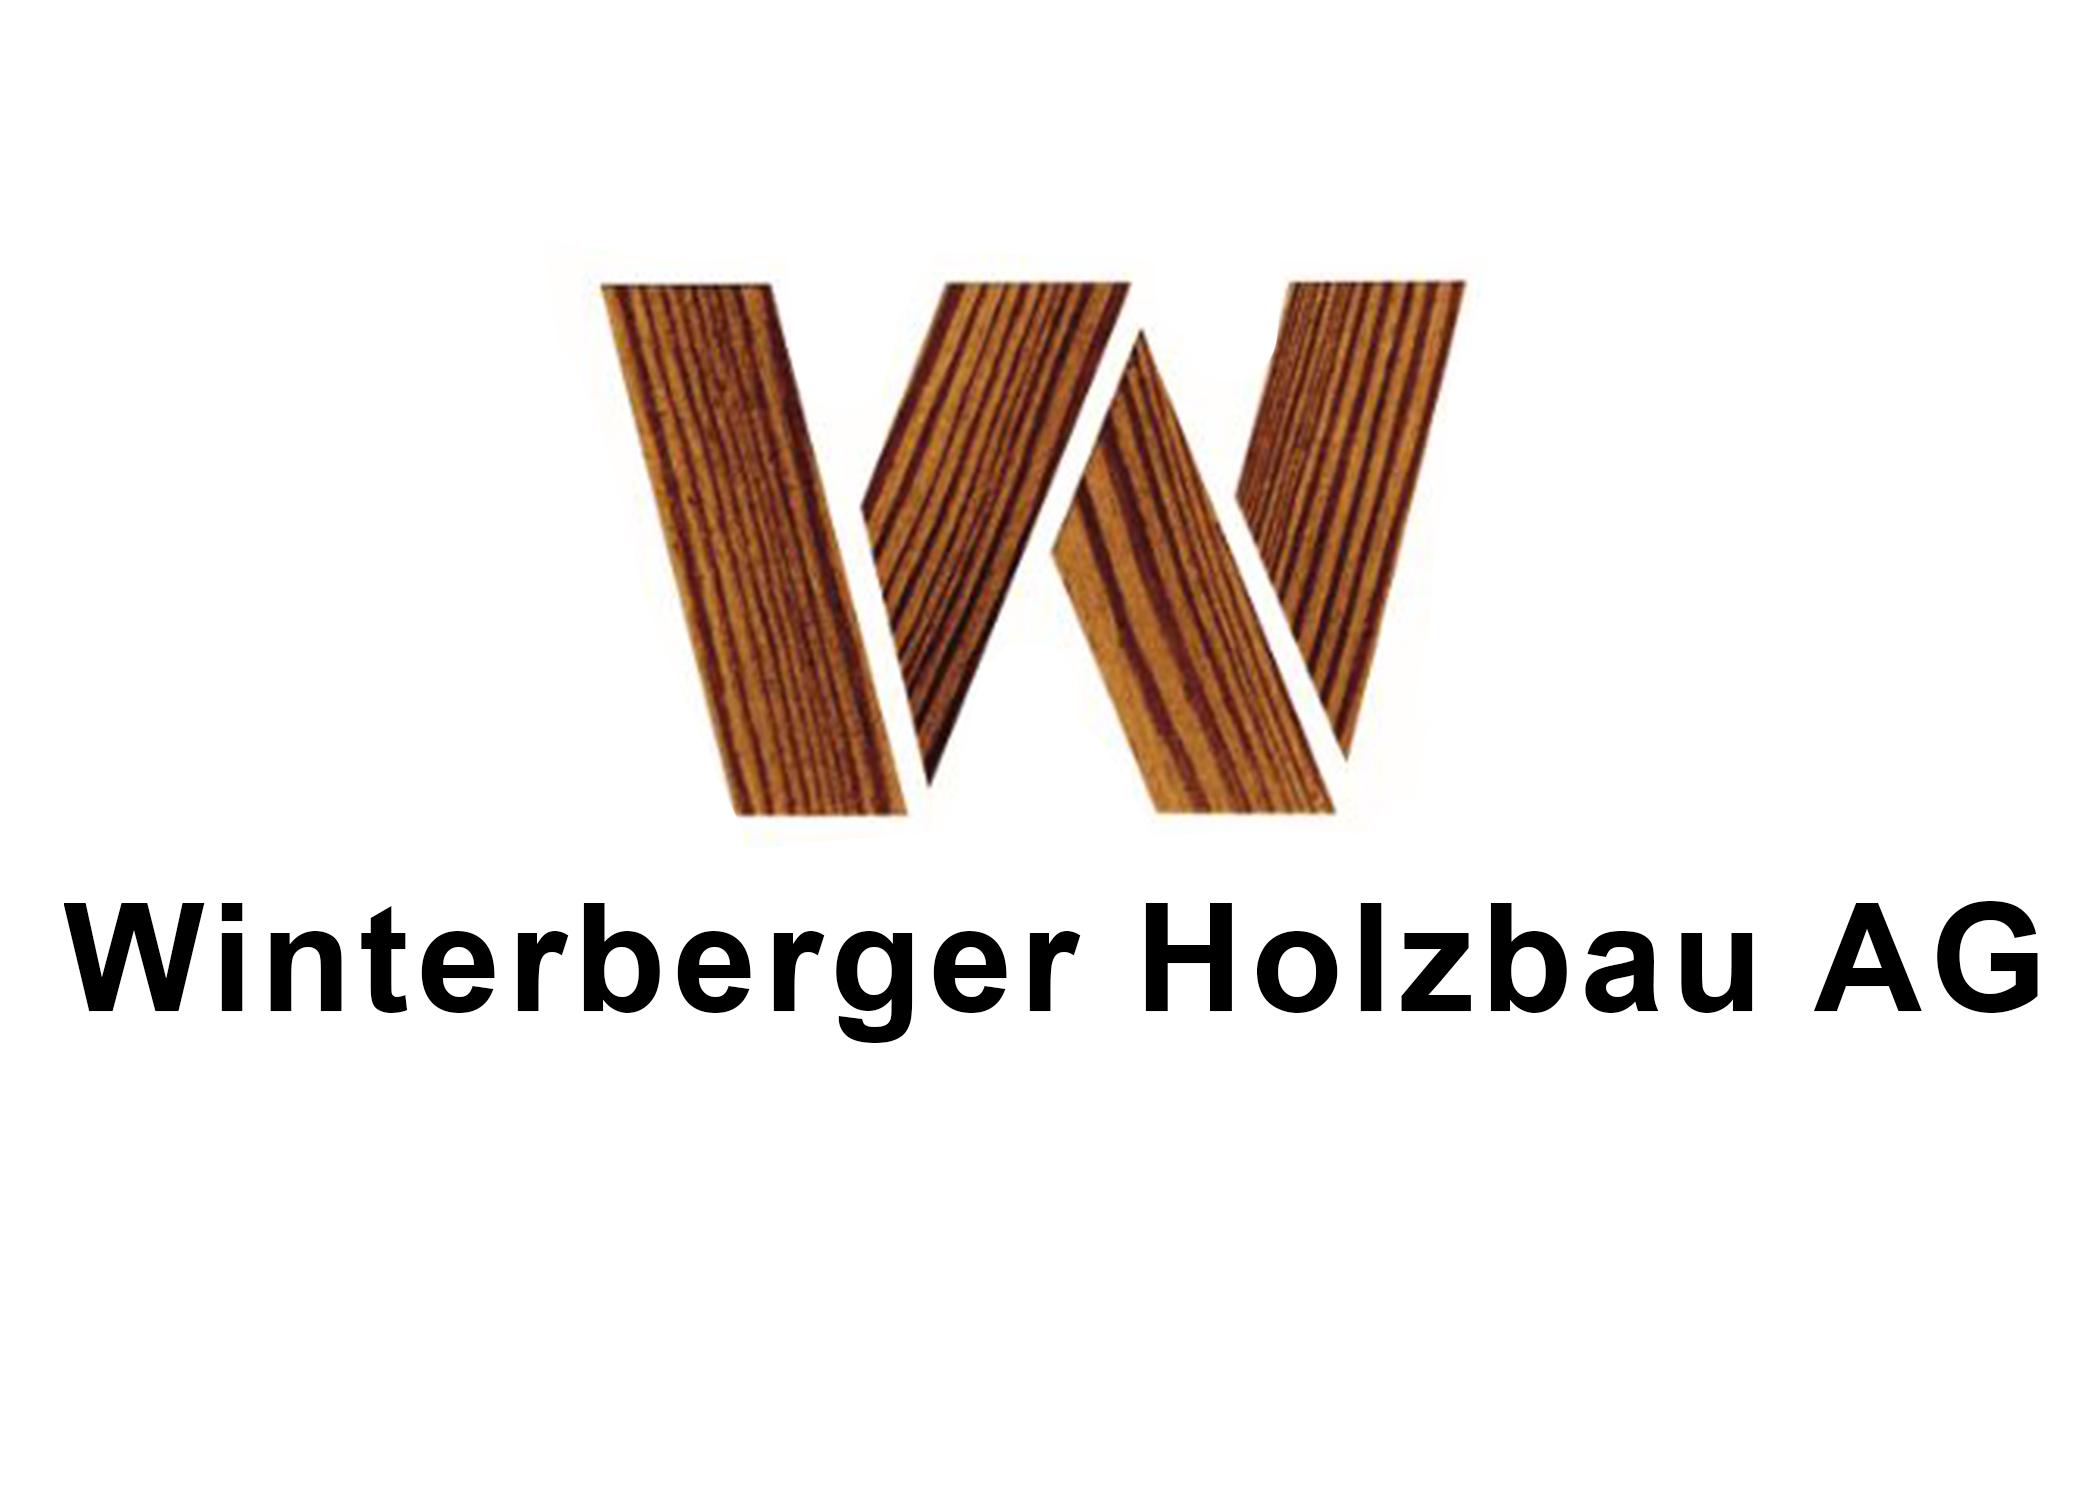 Winterberger Holzbau AG